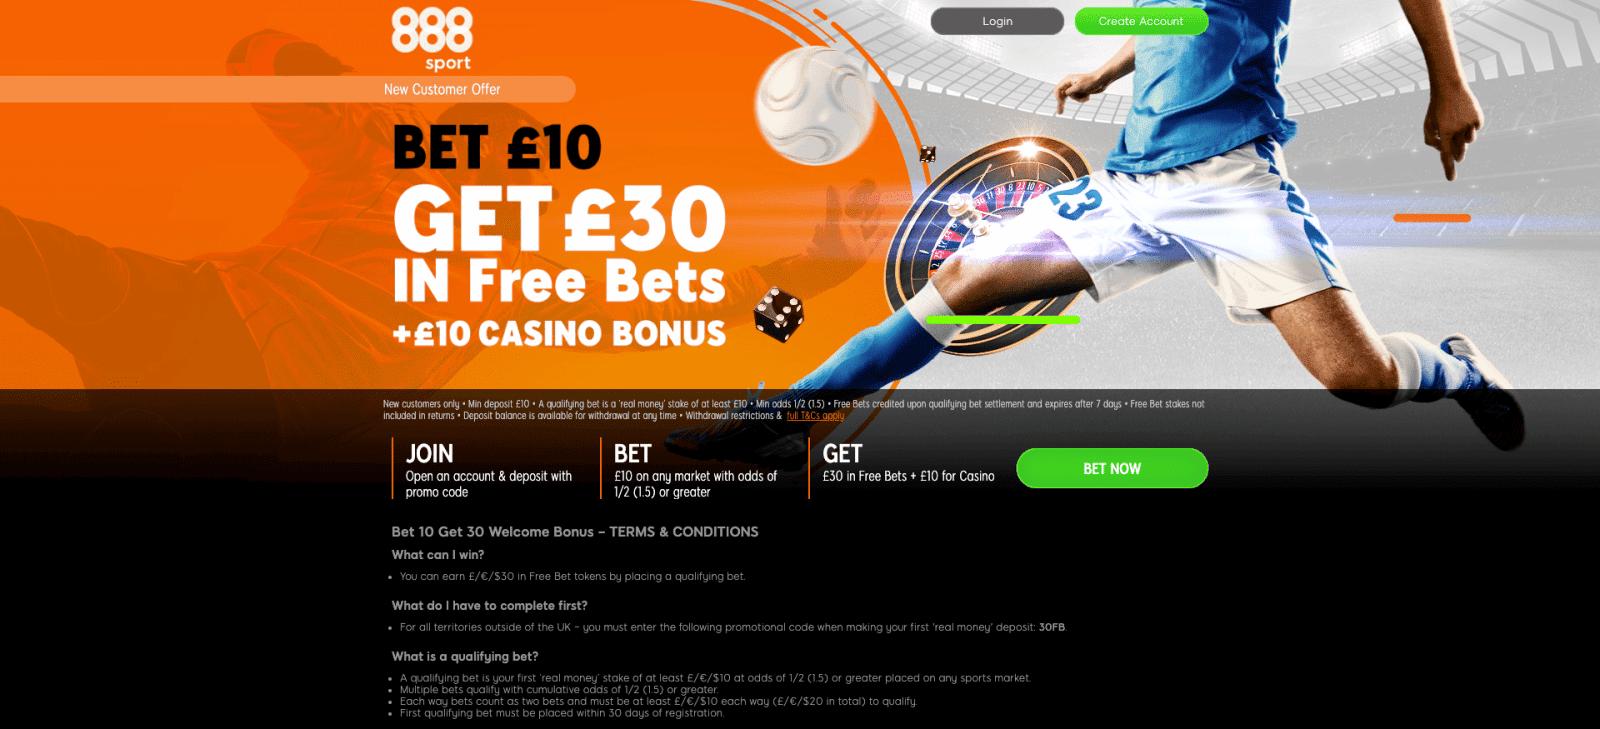 888sport free bet code